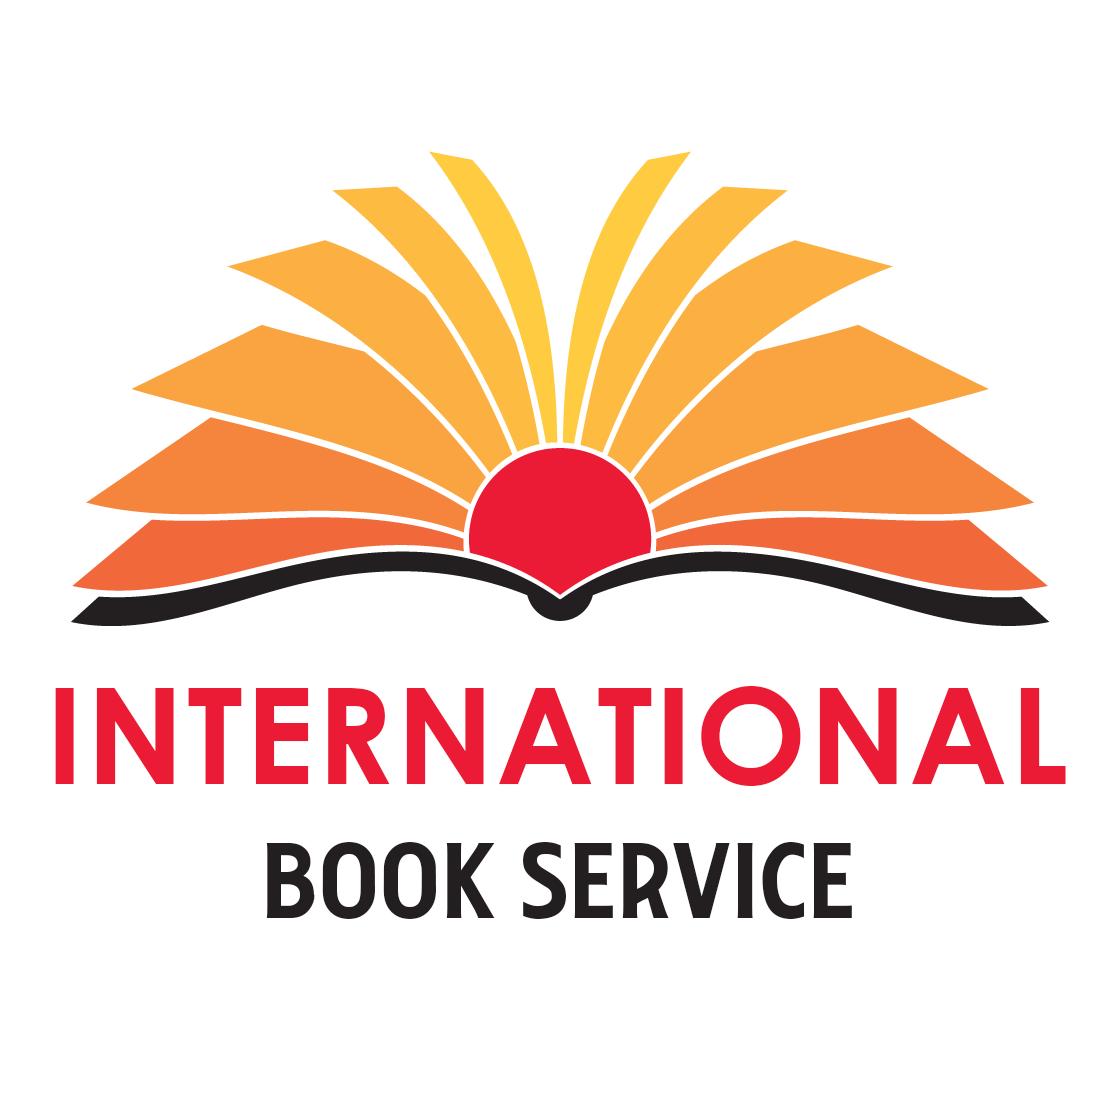 International Book Service